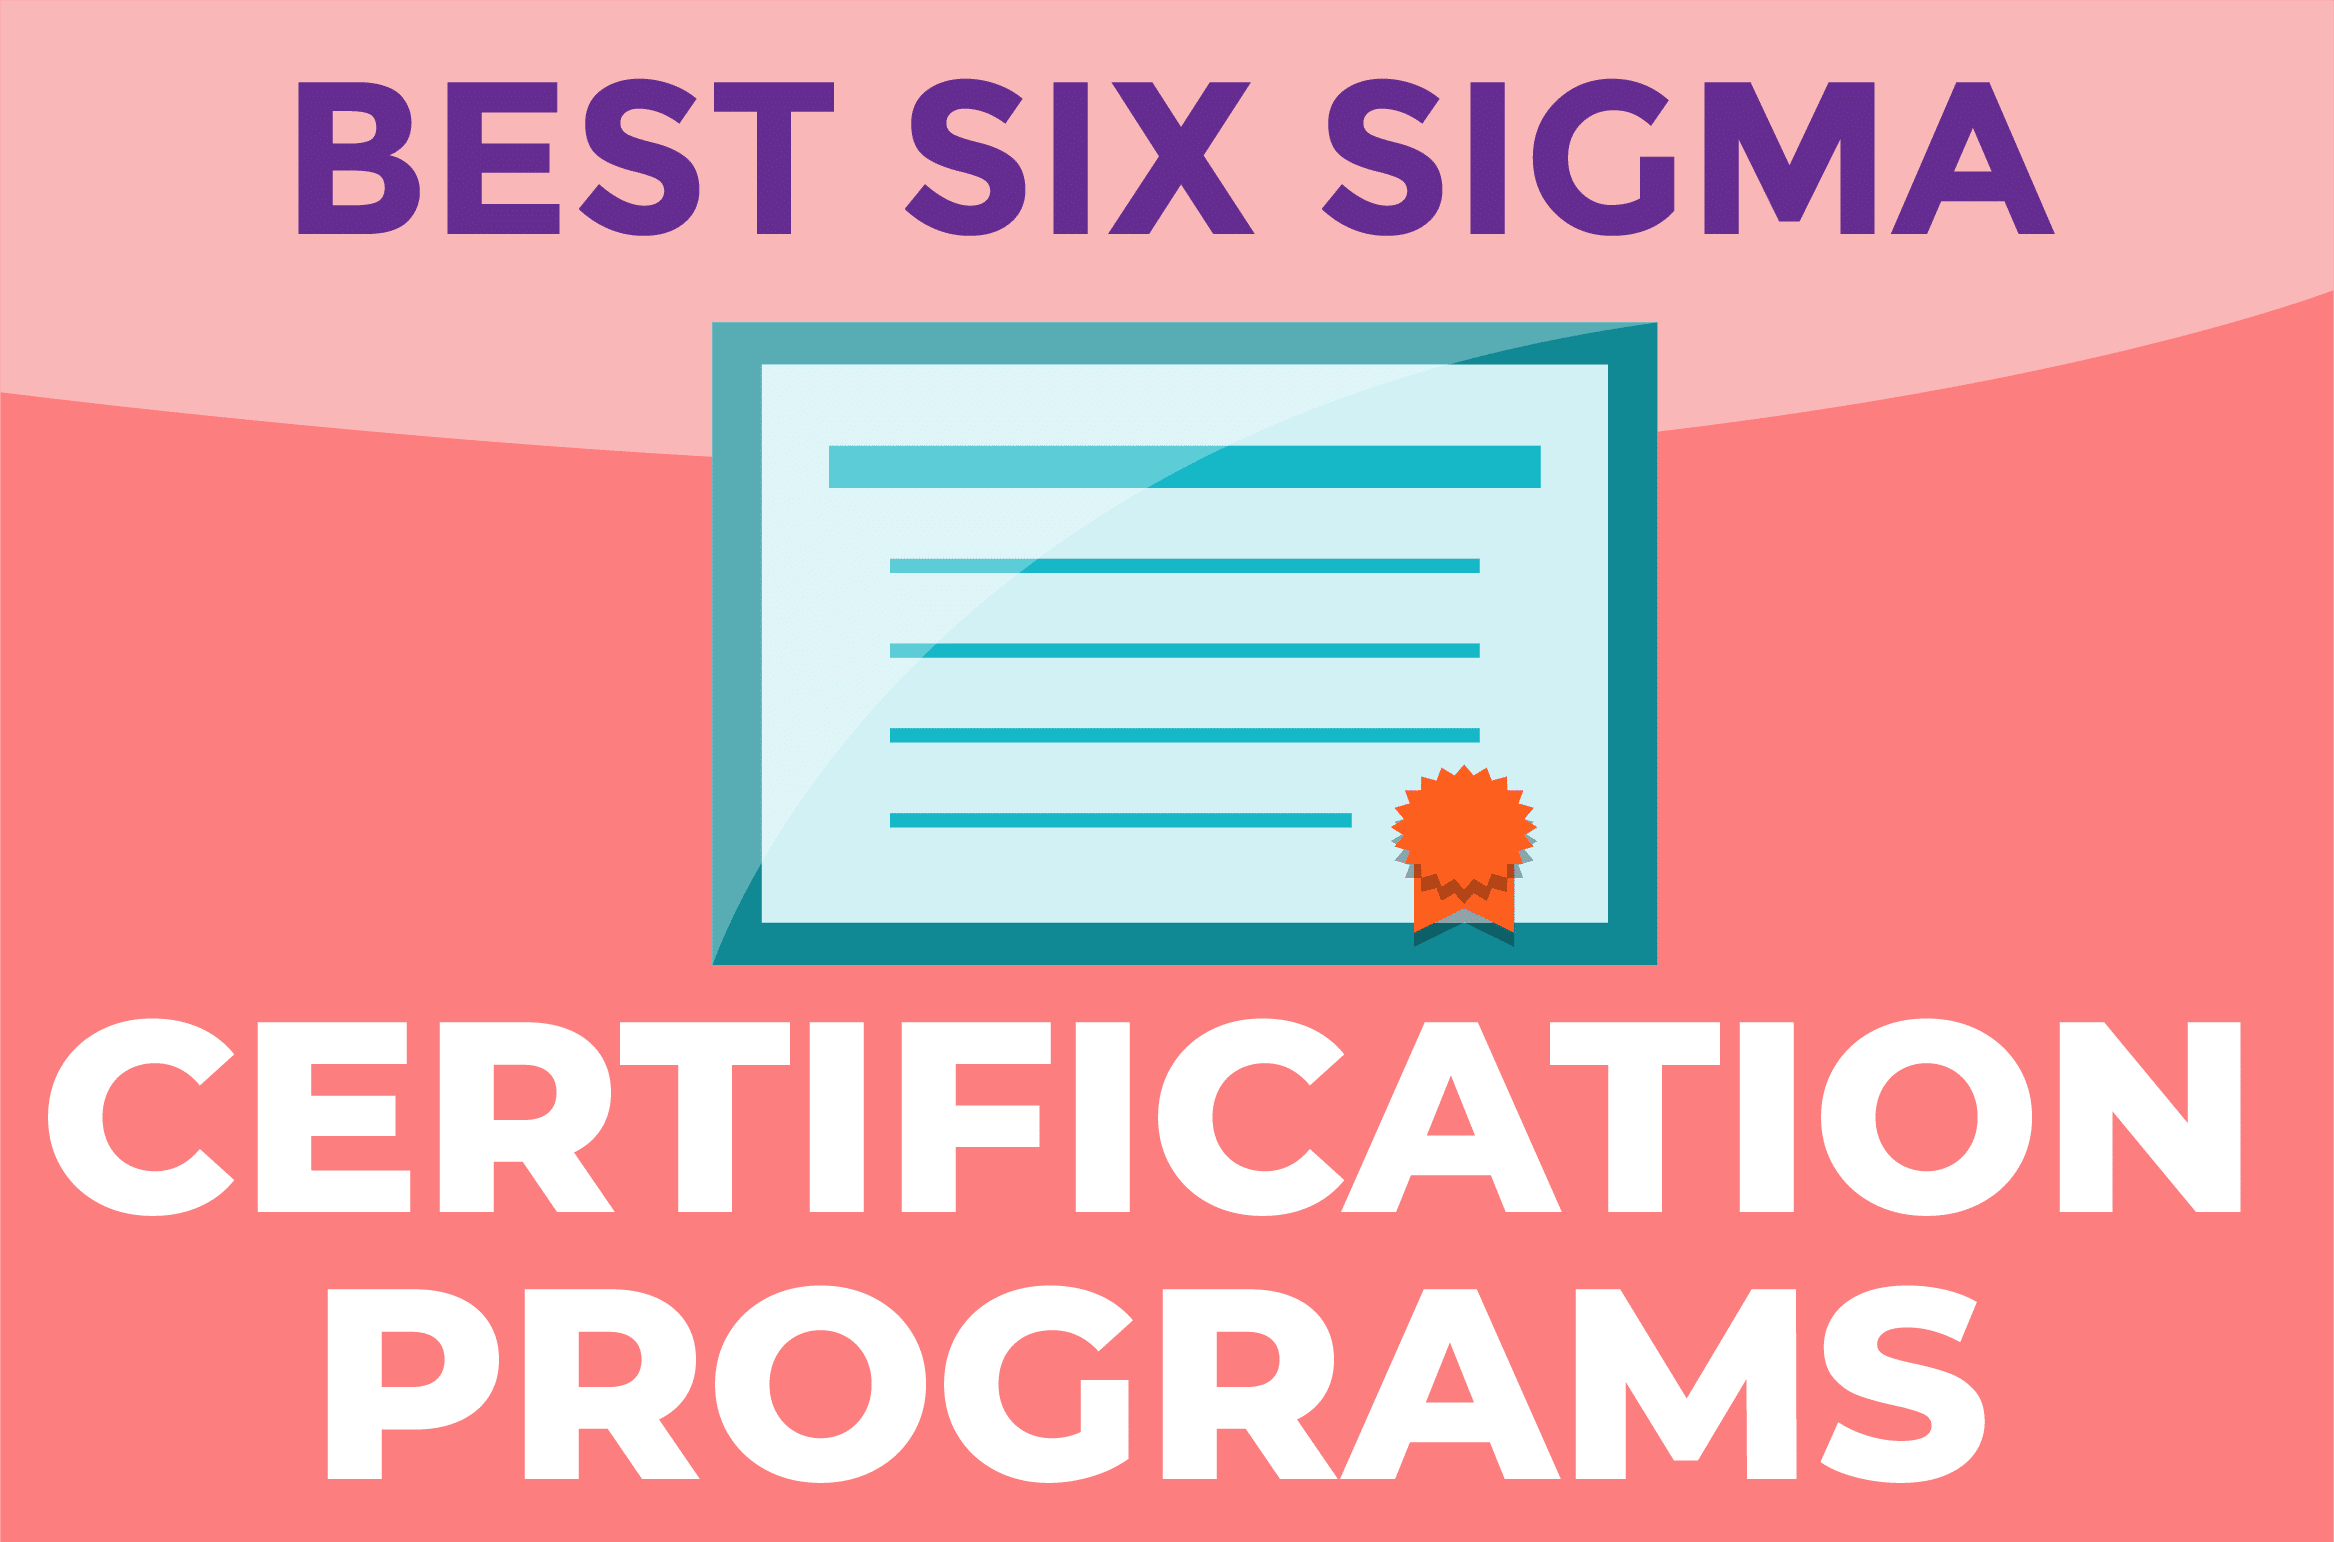 Best Six Sigma Certification Programs